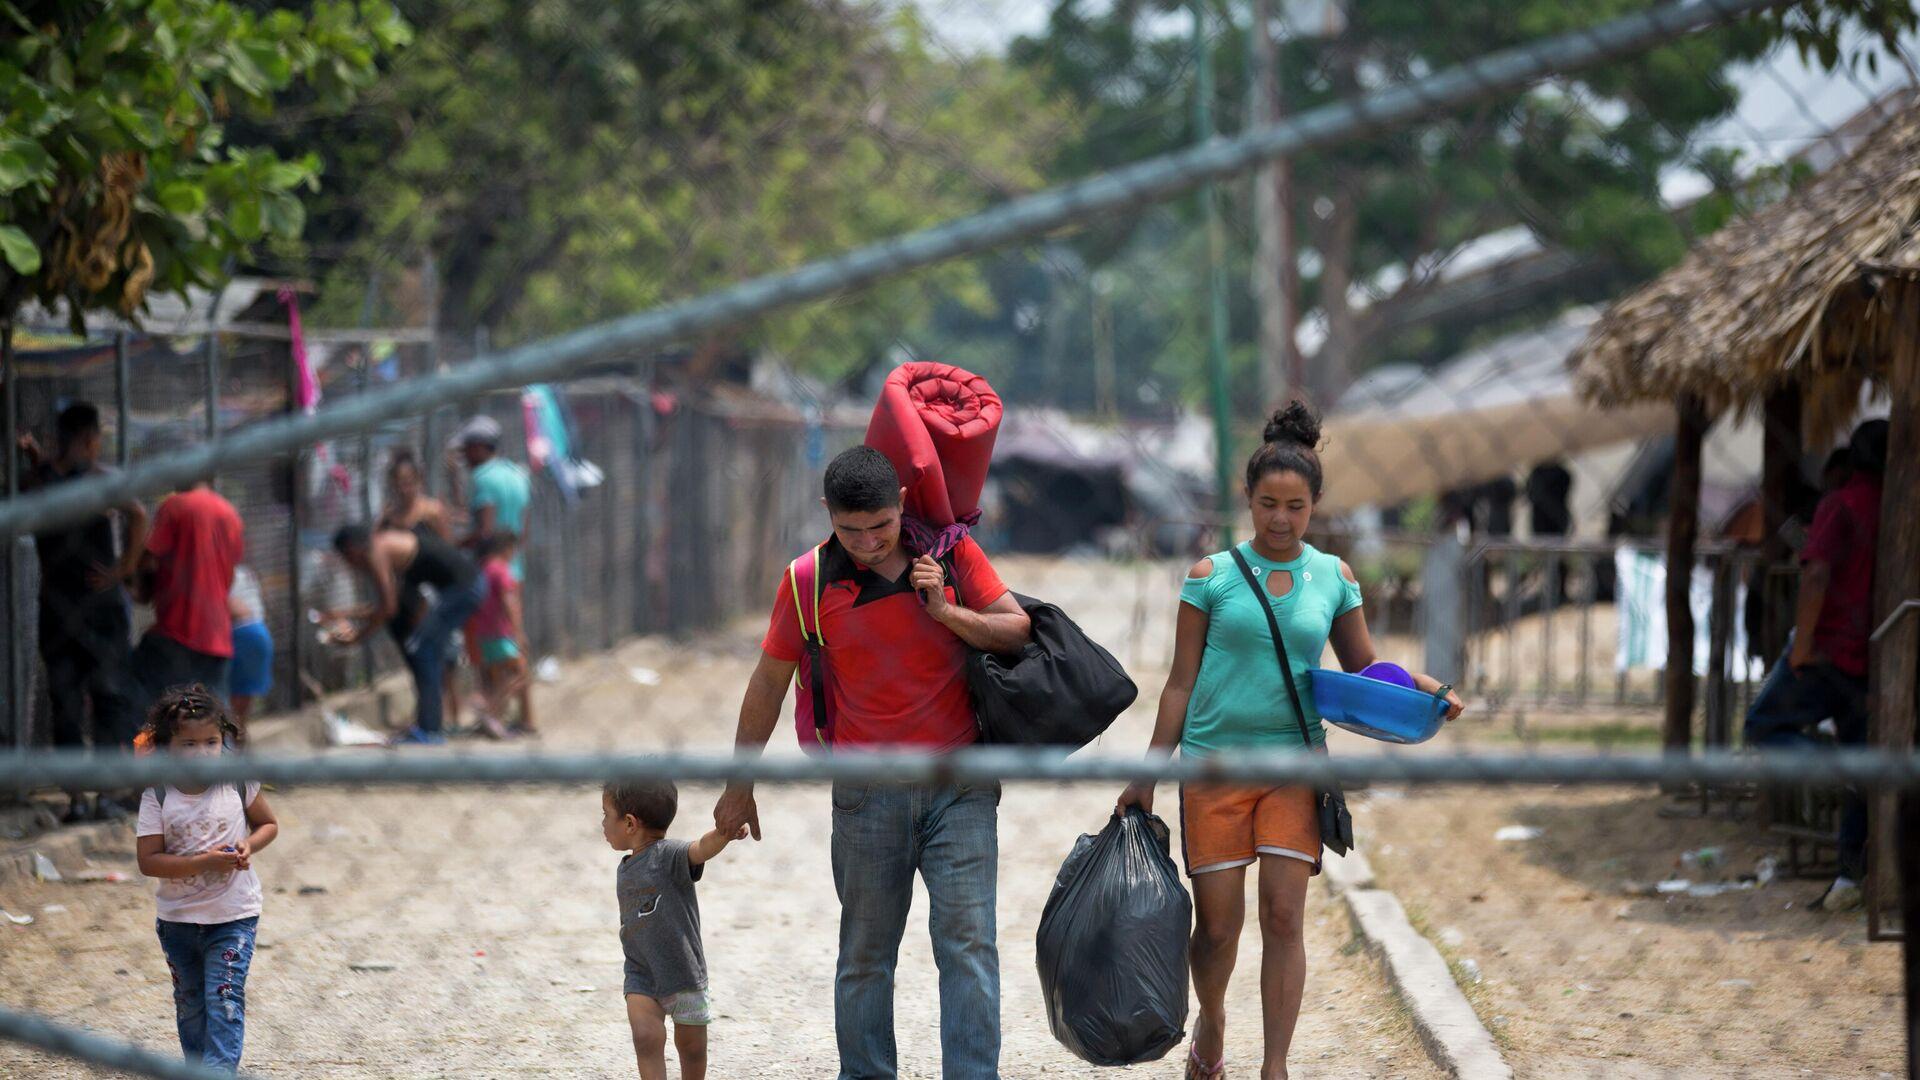 Migrantes centroamericanos en México - Sputnik Mundo, 1920, 08.10.2021